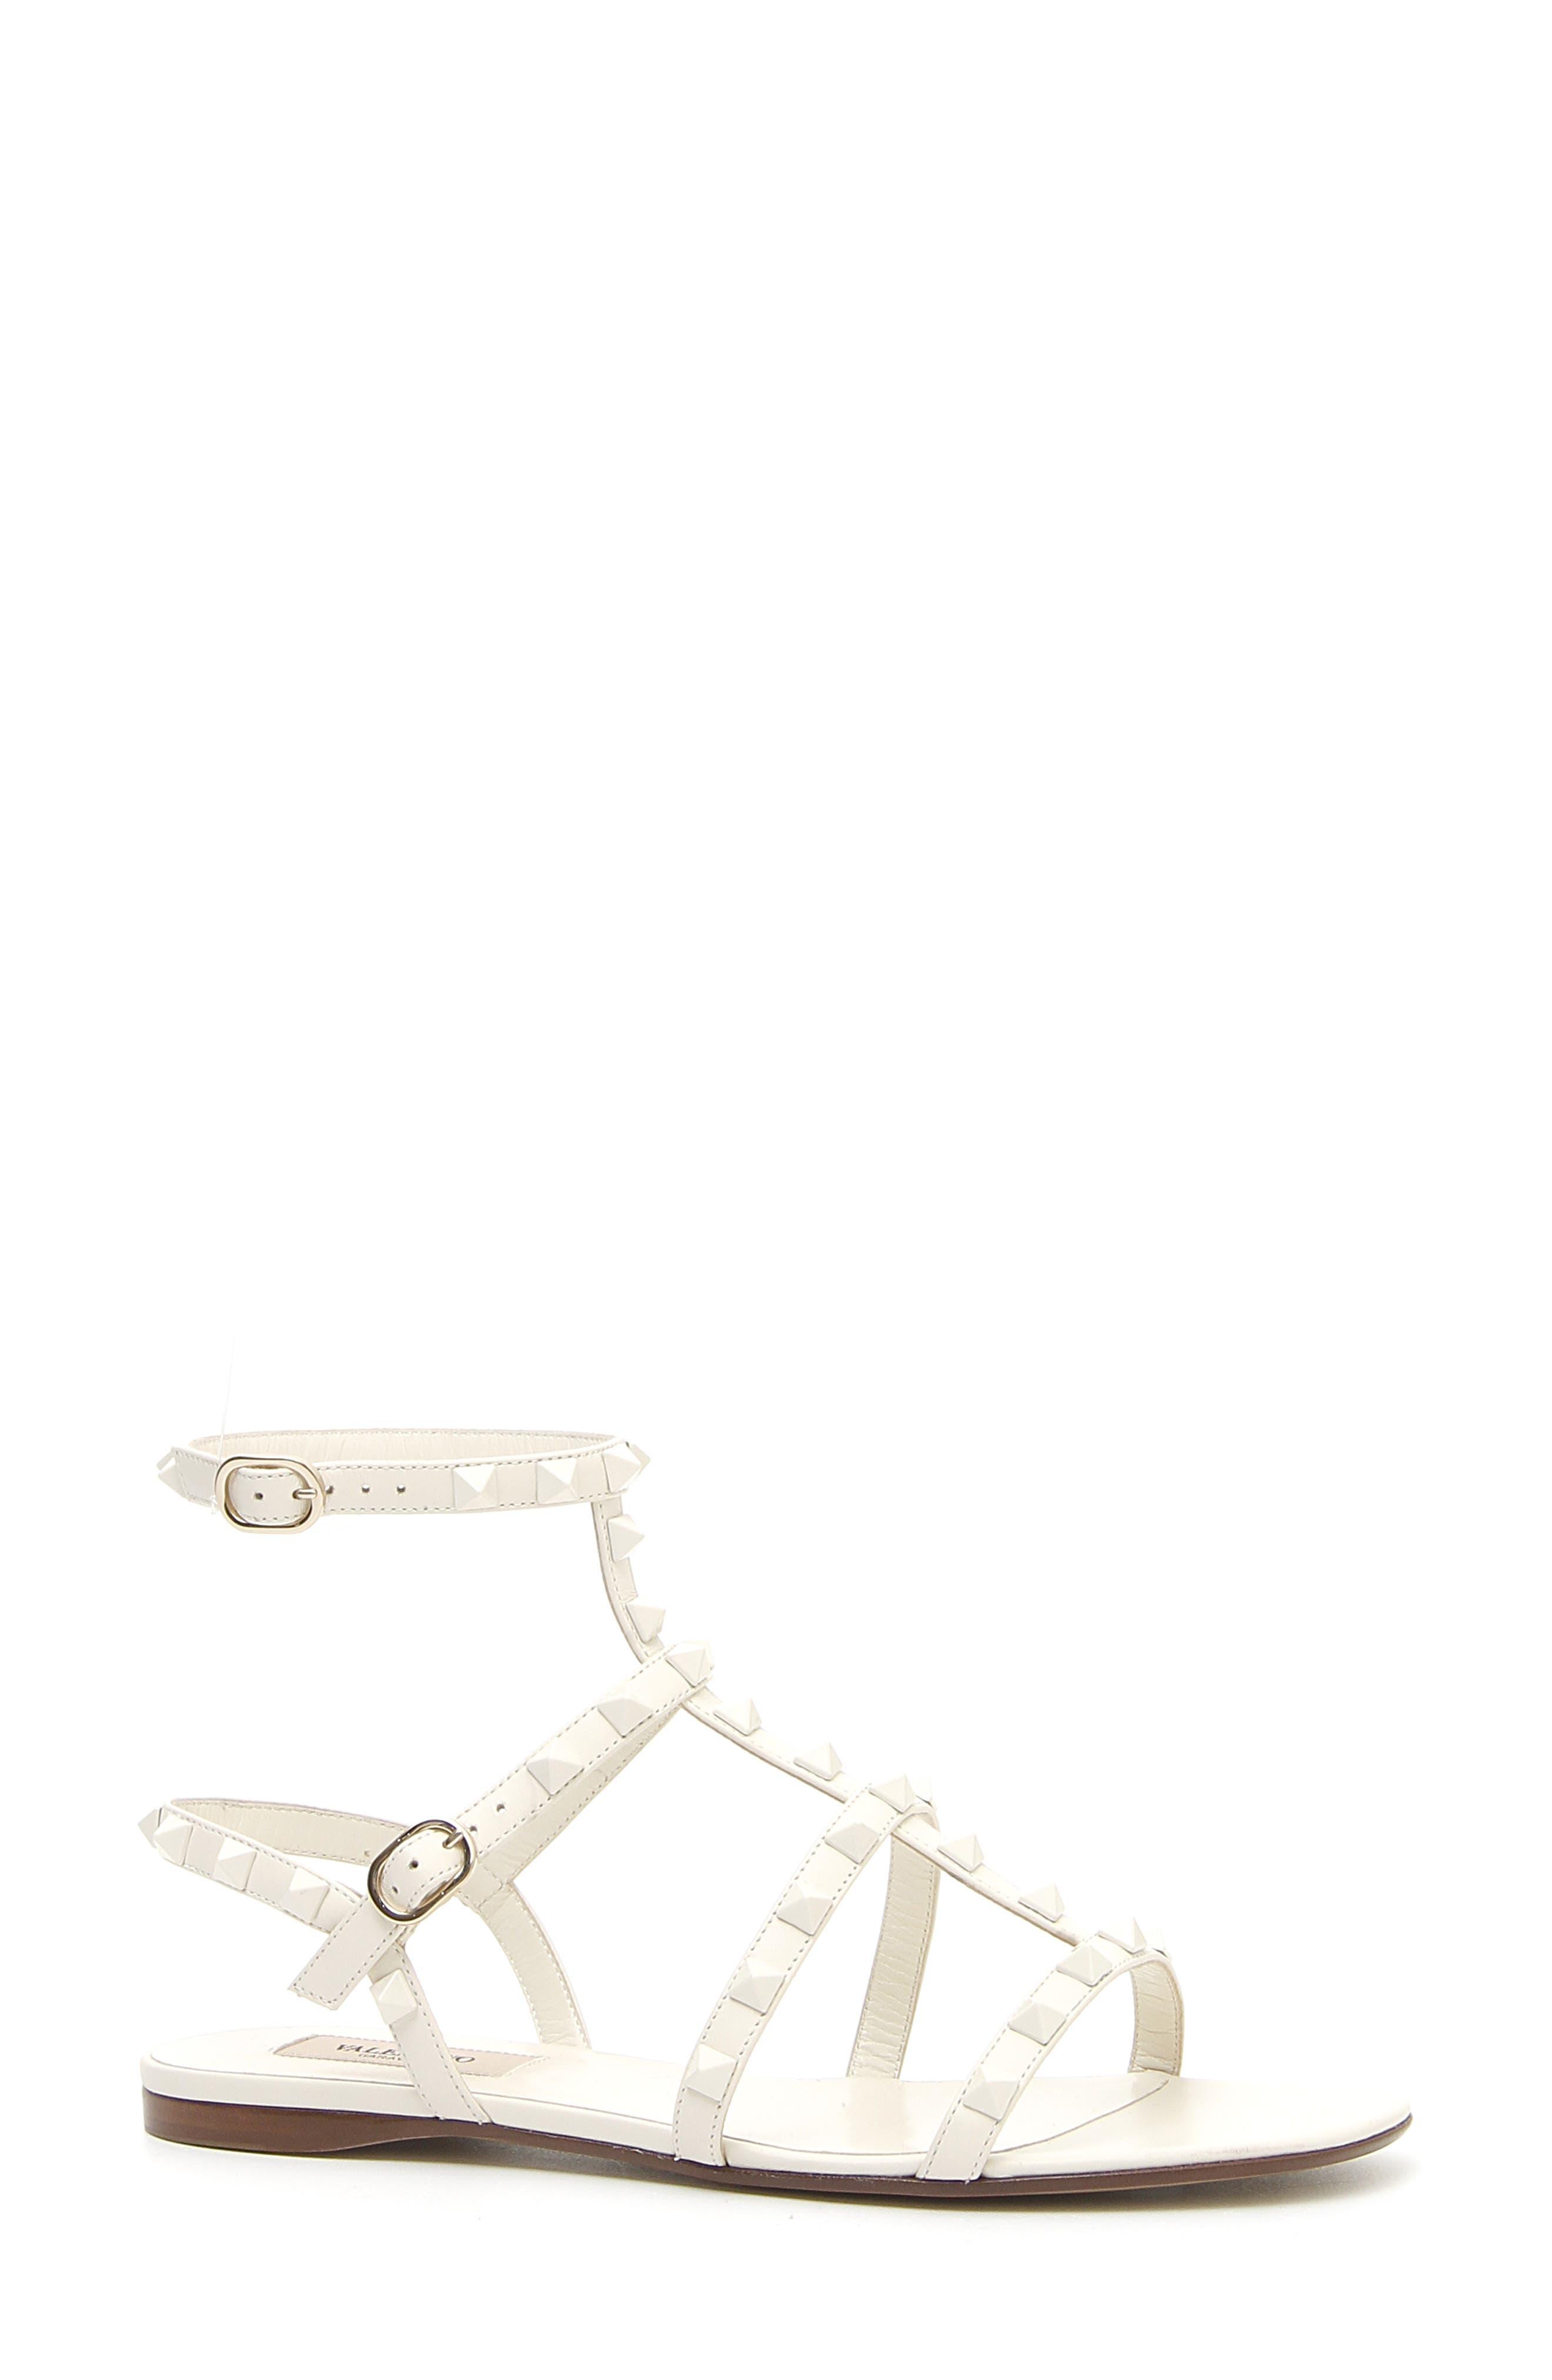 VALENTINO GARAVANI Rockstud Gladiator Sandal, Main, color, IVORY/ IVORY